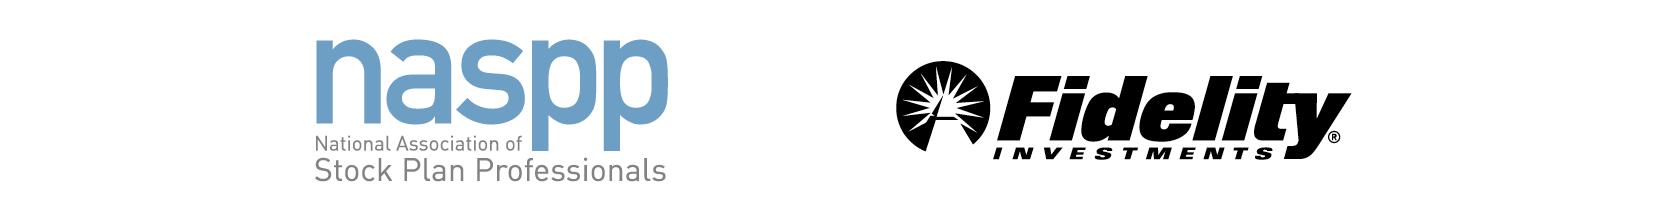 NASPP-Fidelity logos